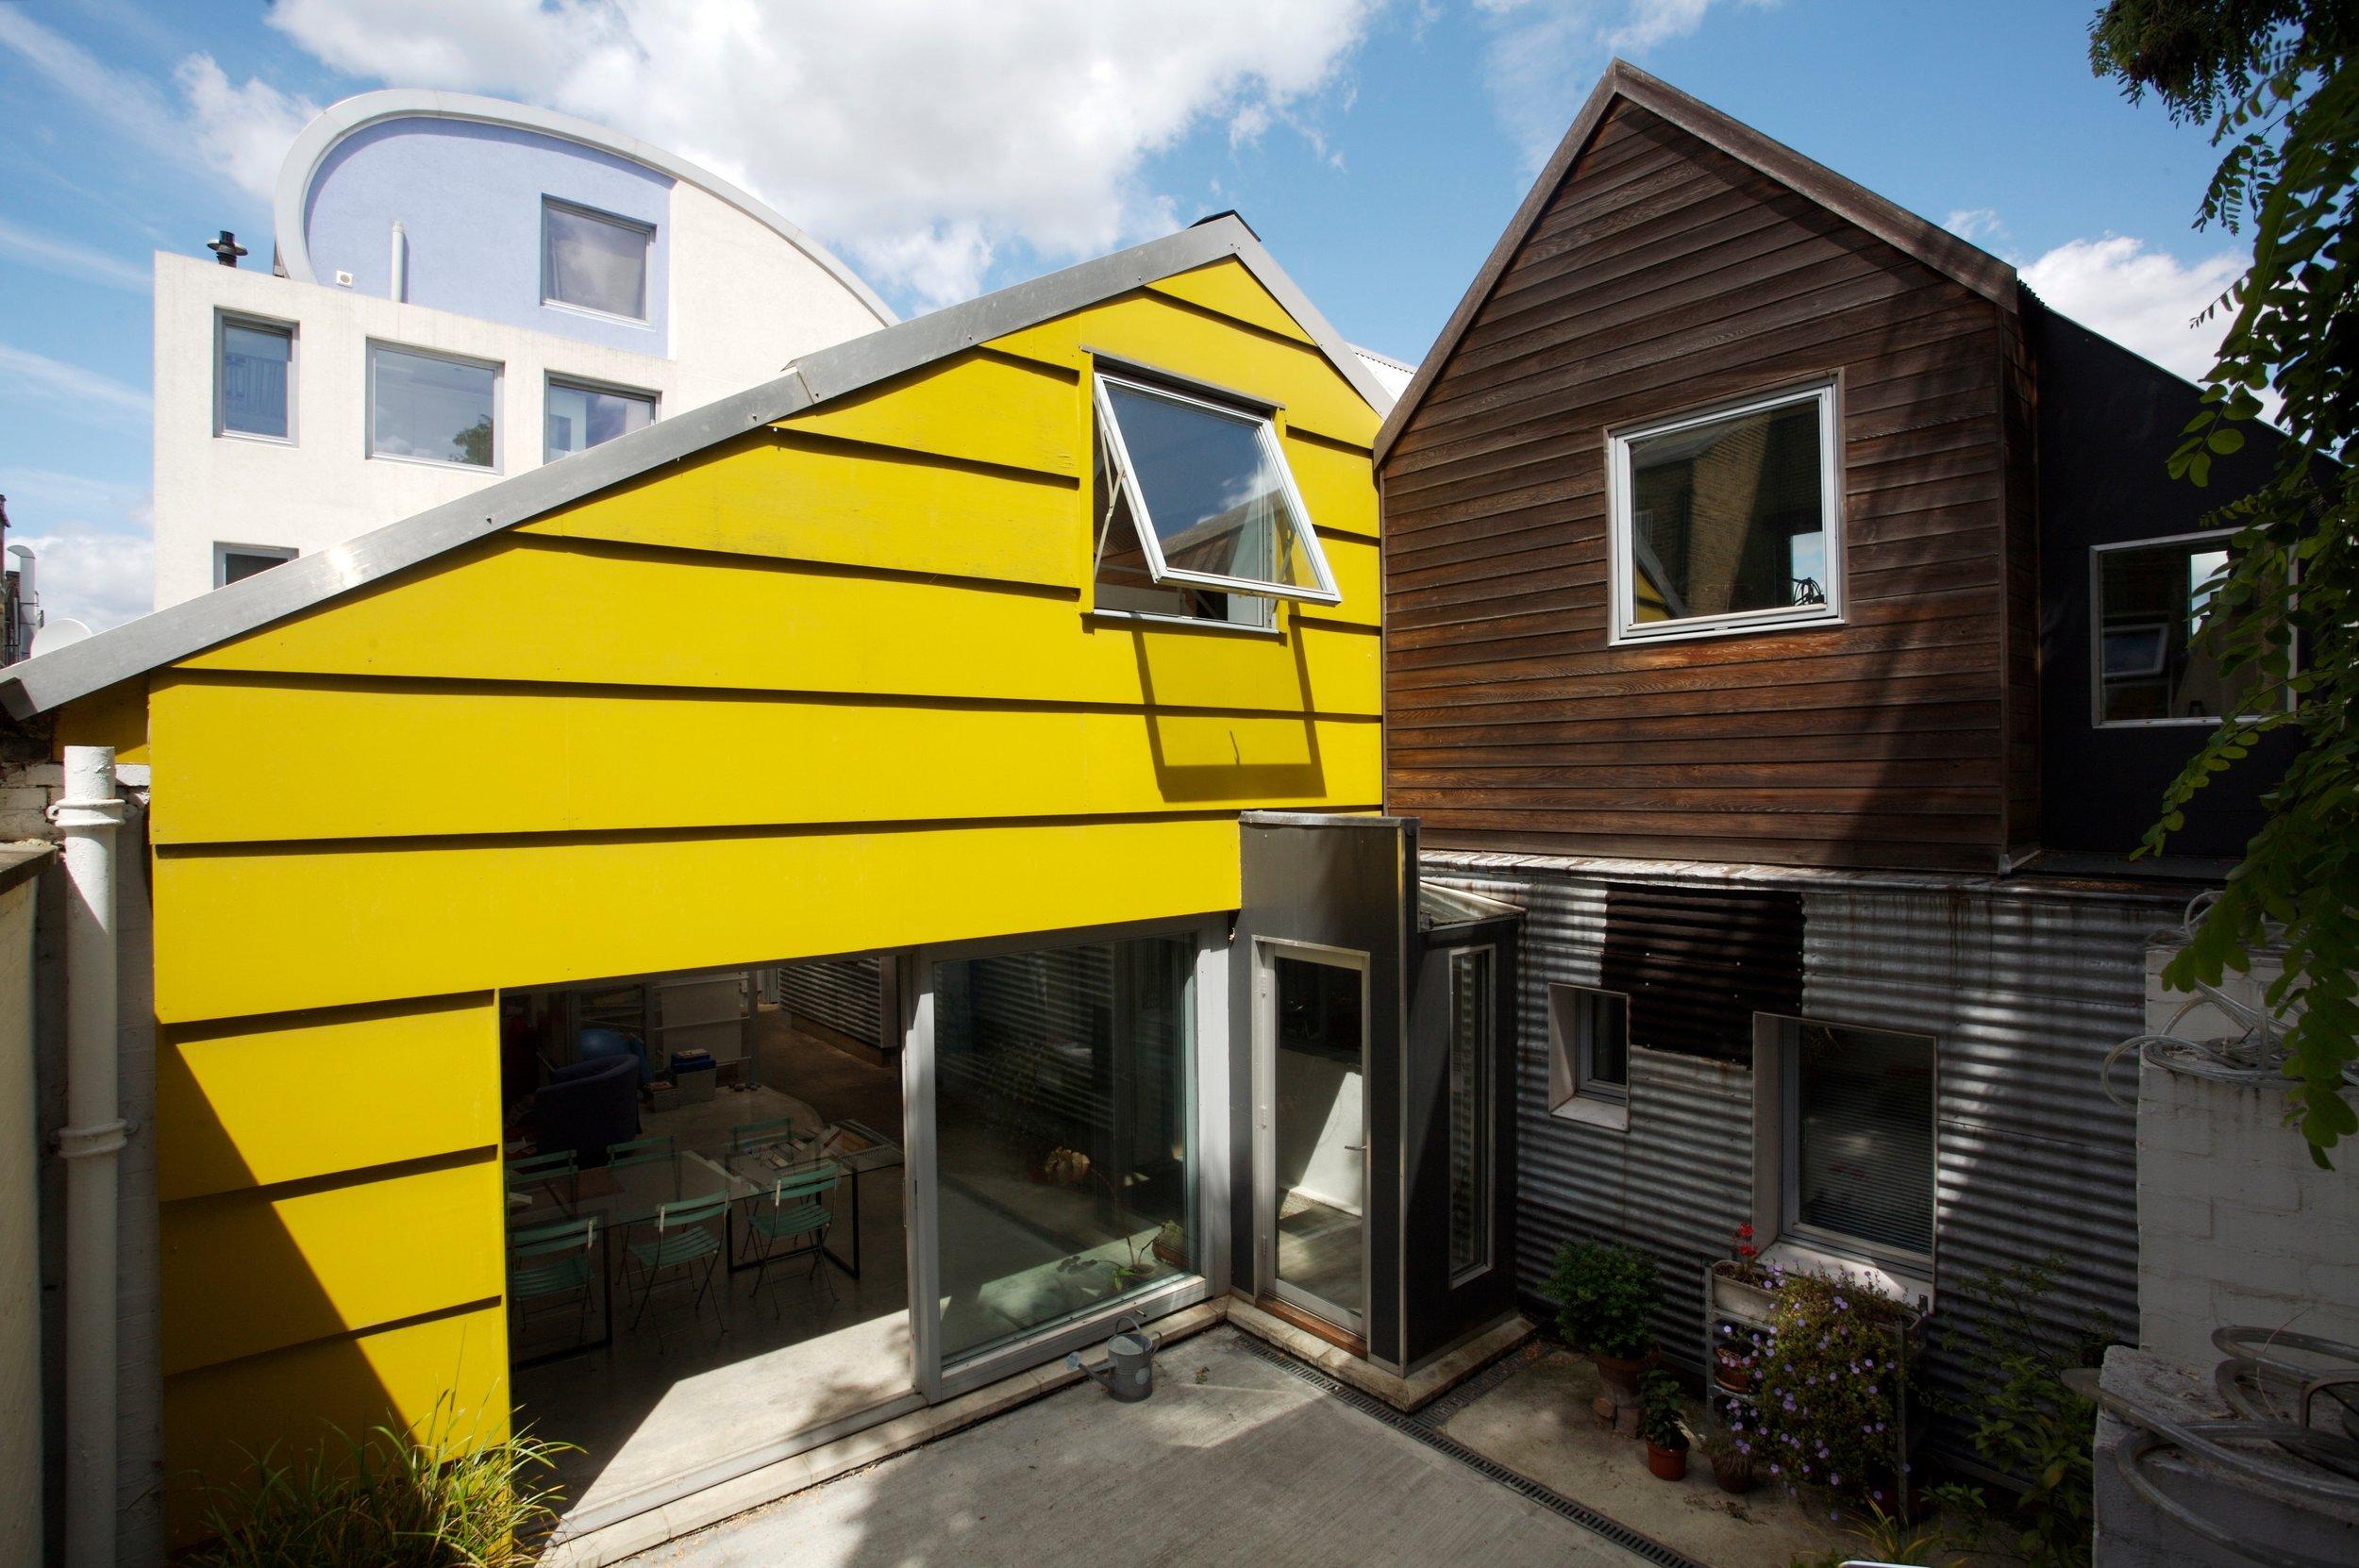 Quay houseEast elevation & courtyard.jpg